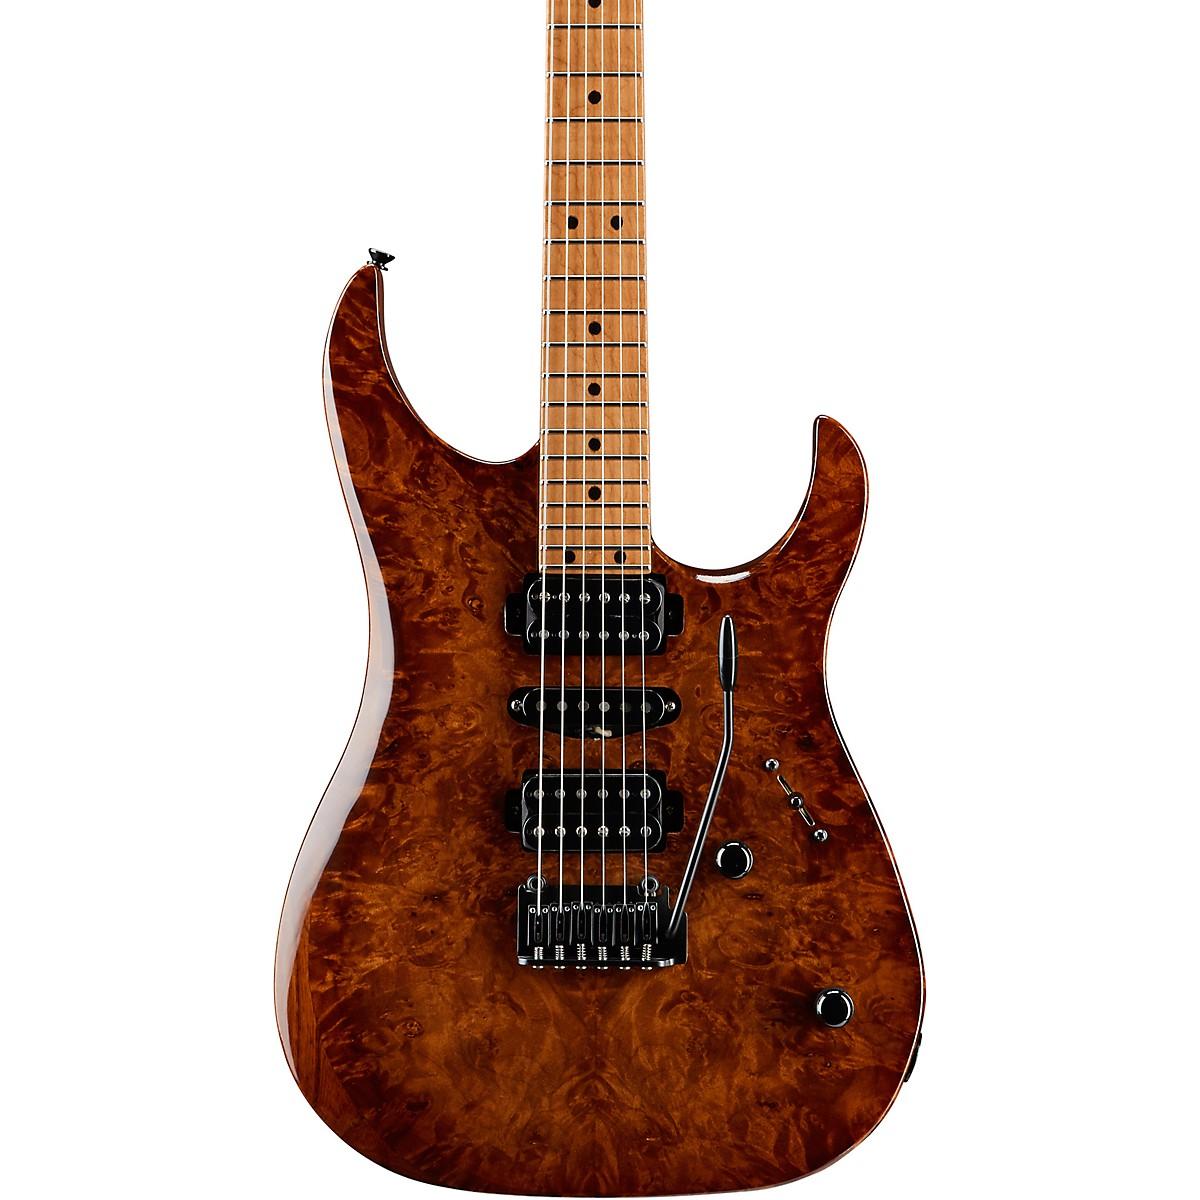 LsL Instruments XT4-DX 24 Fret Exotic HSH Roasted Burl Maple Top Electric Guitar